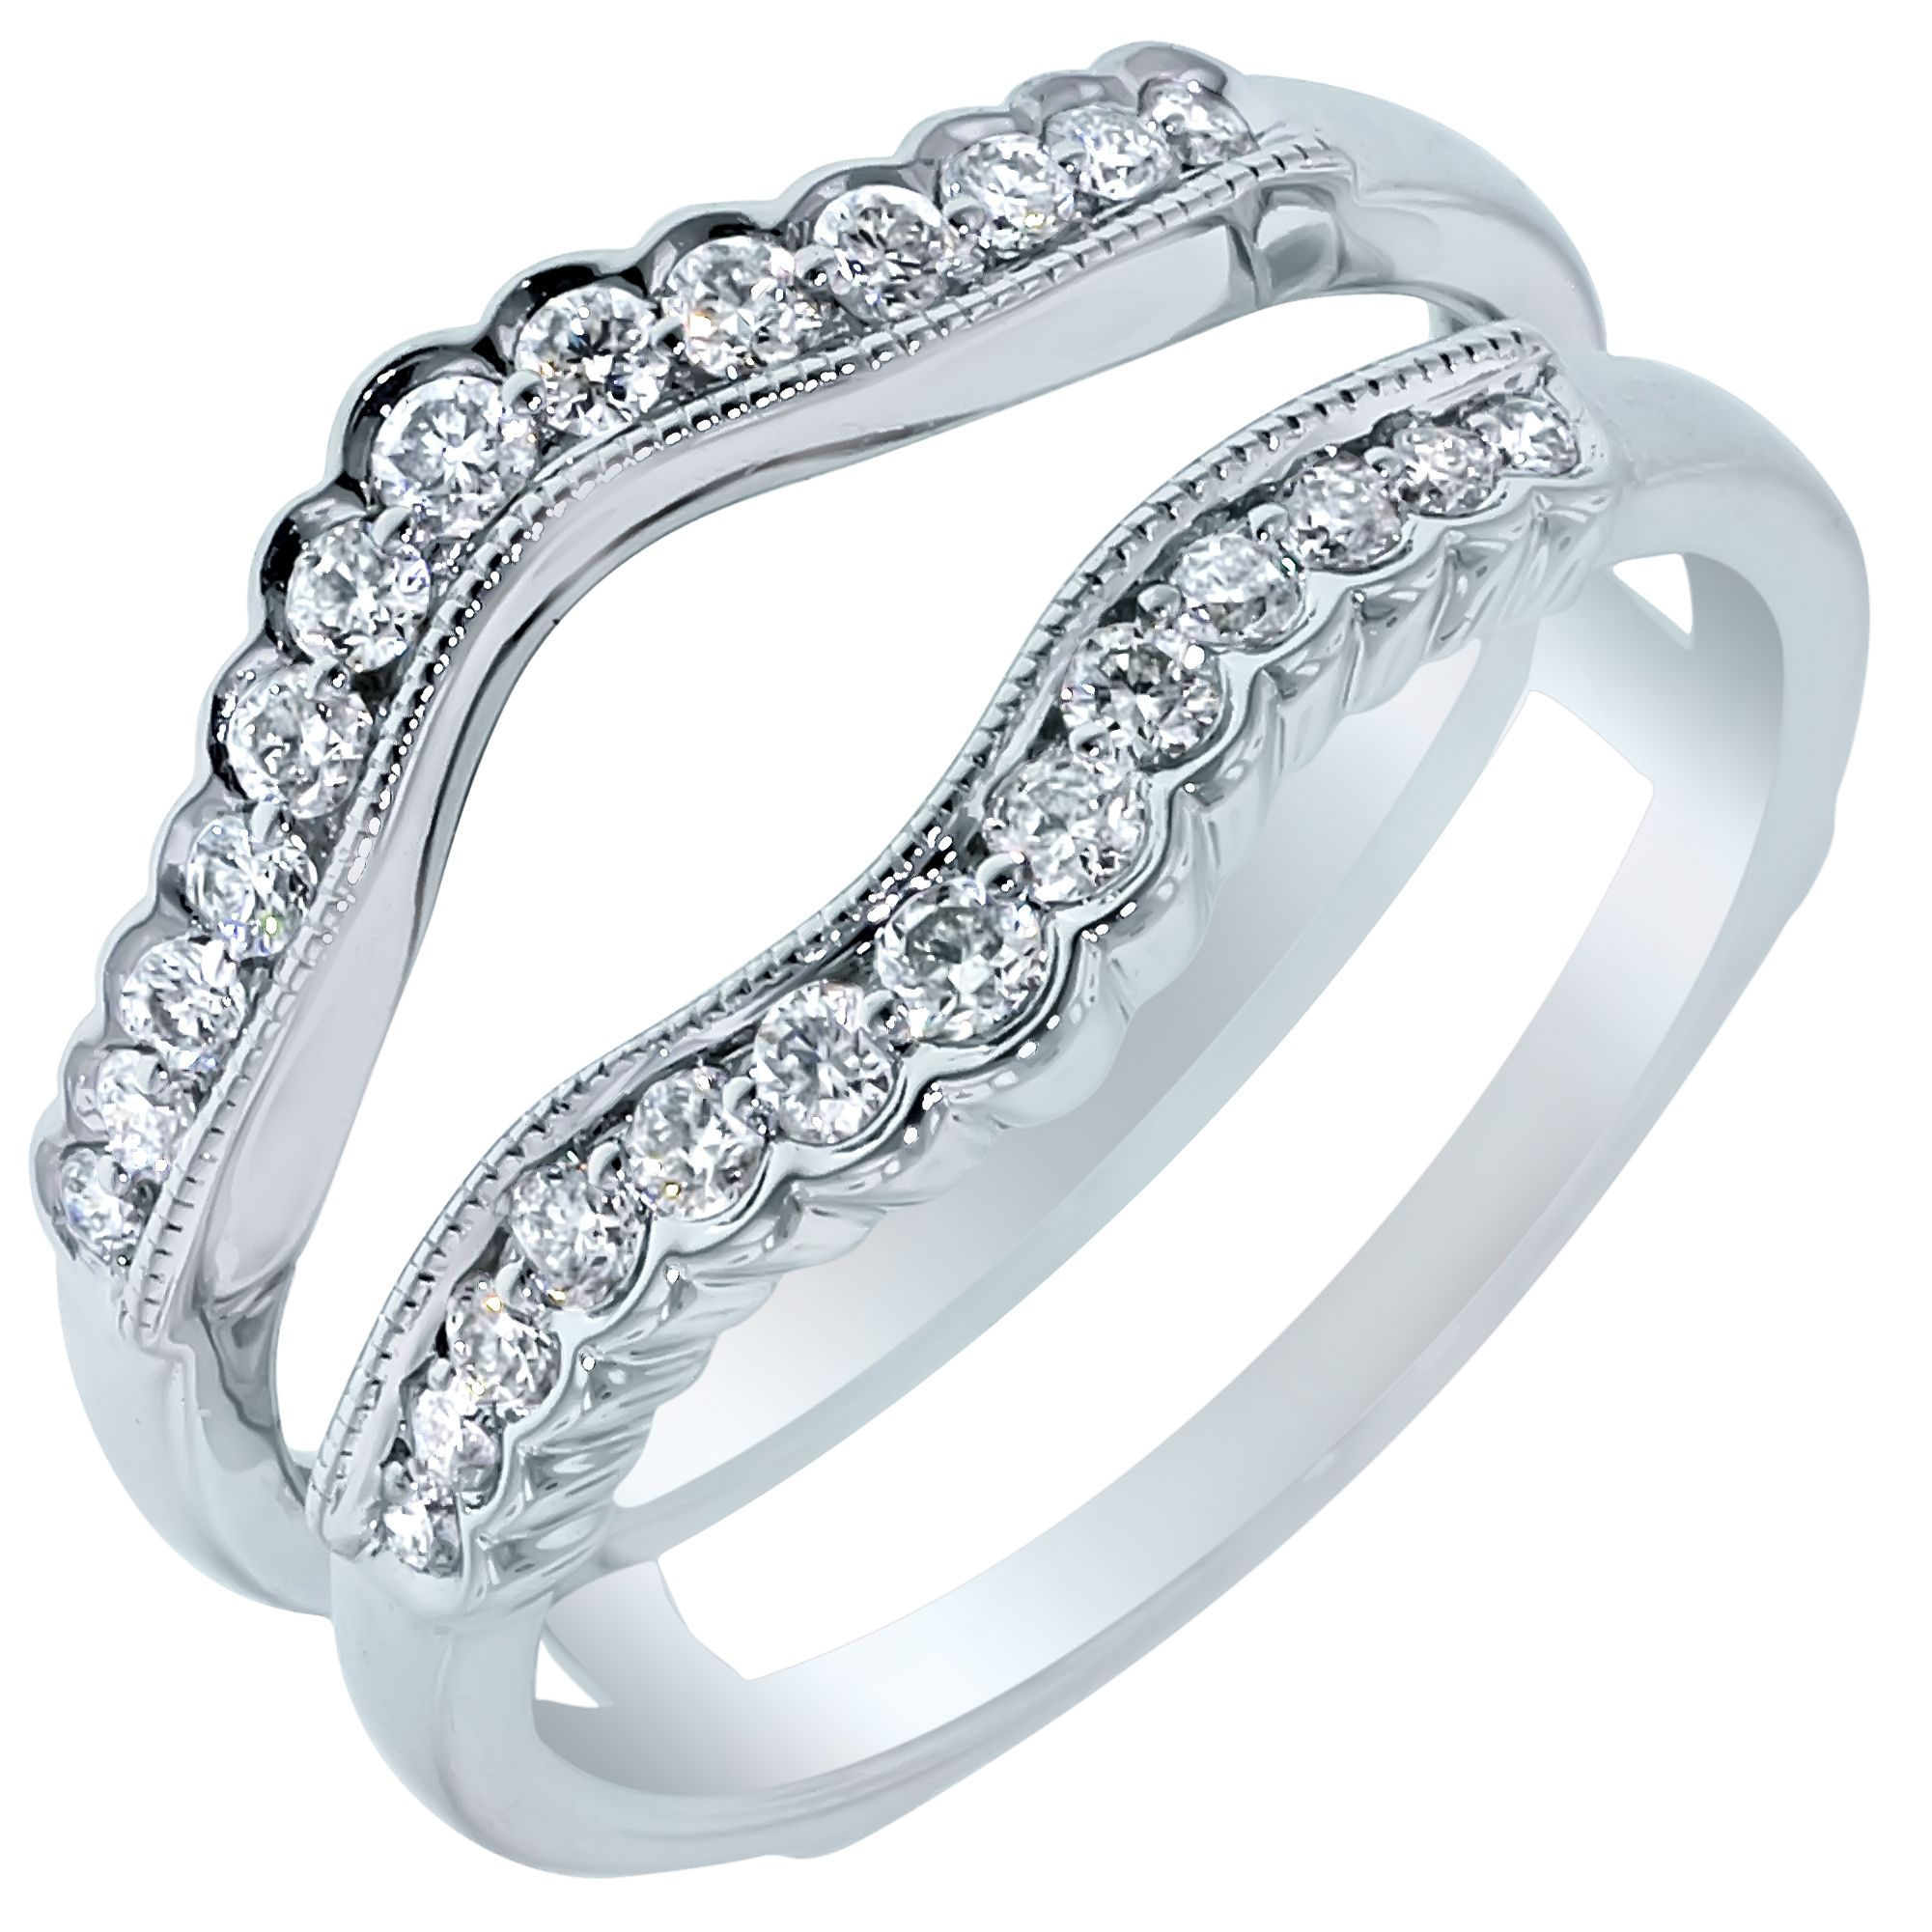 Vintage Style Engagement Ring Insert 14k White Gold Diamond Wedding Band 1 4ctw Vintage Style Rings 14k White Gold Engagement Rings Diamond Wedding Bands